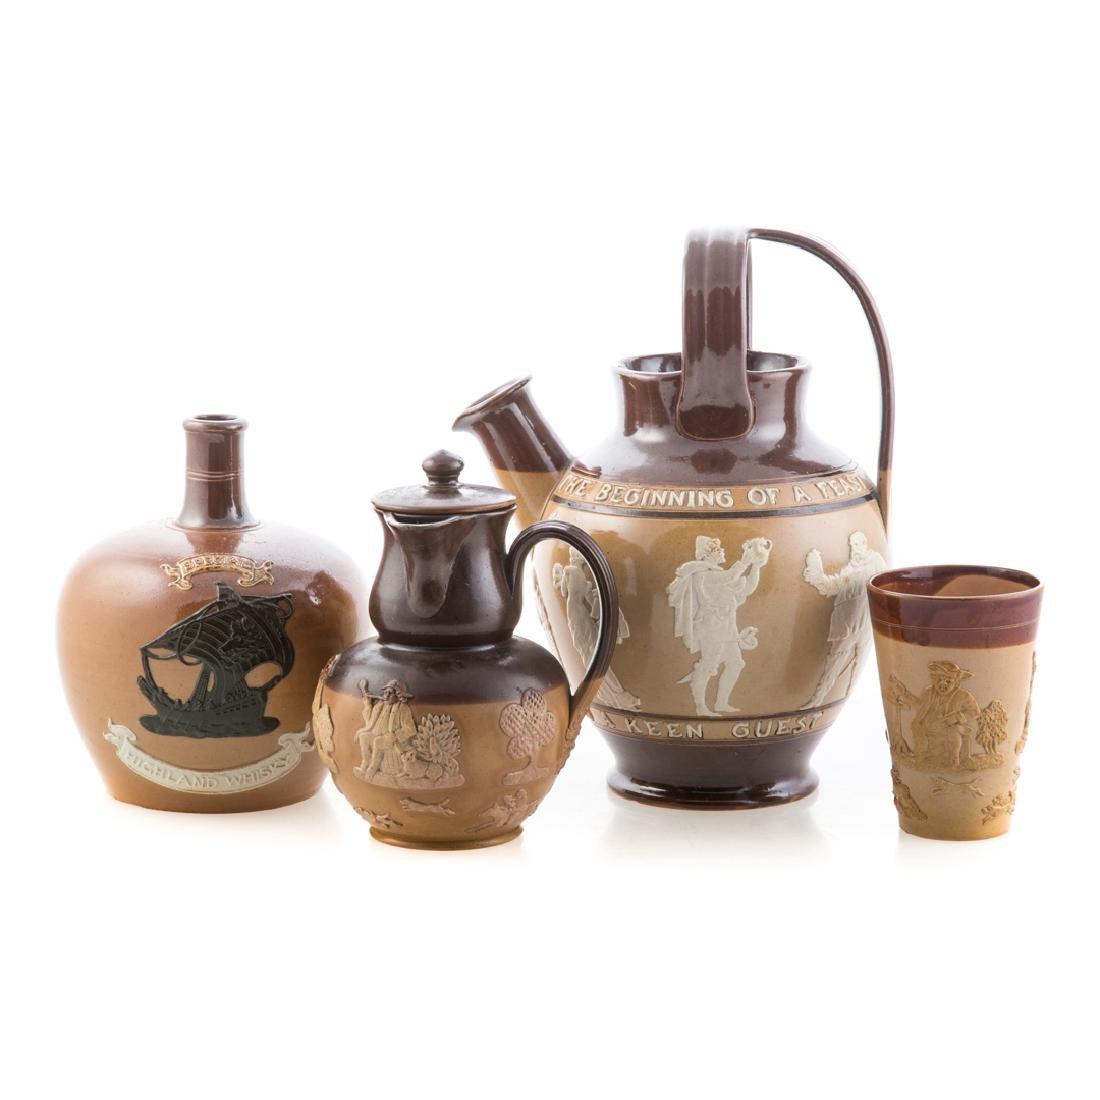 Four English salt glazed stoneware articles